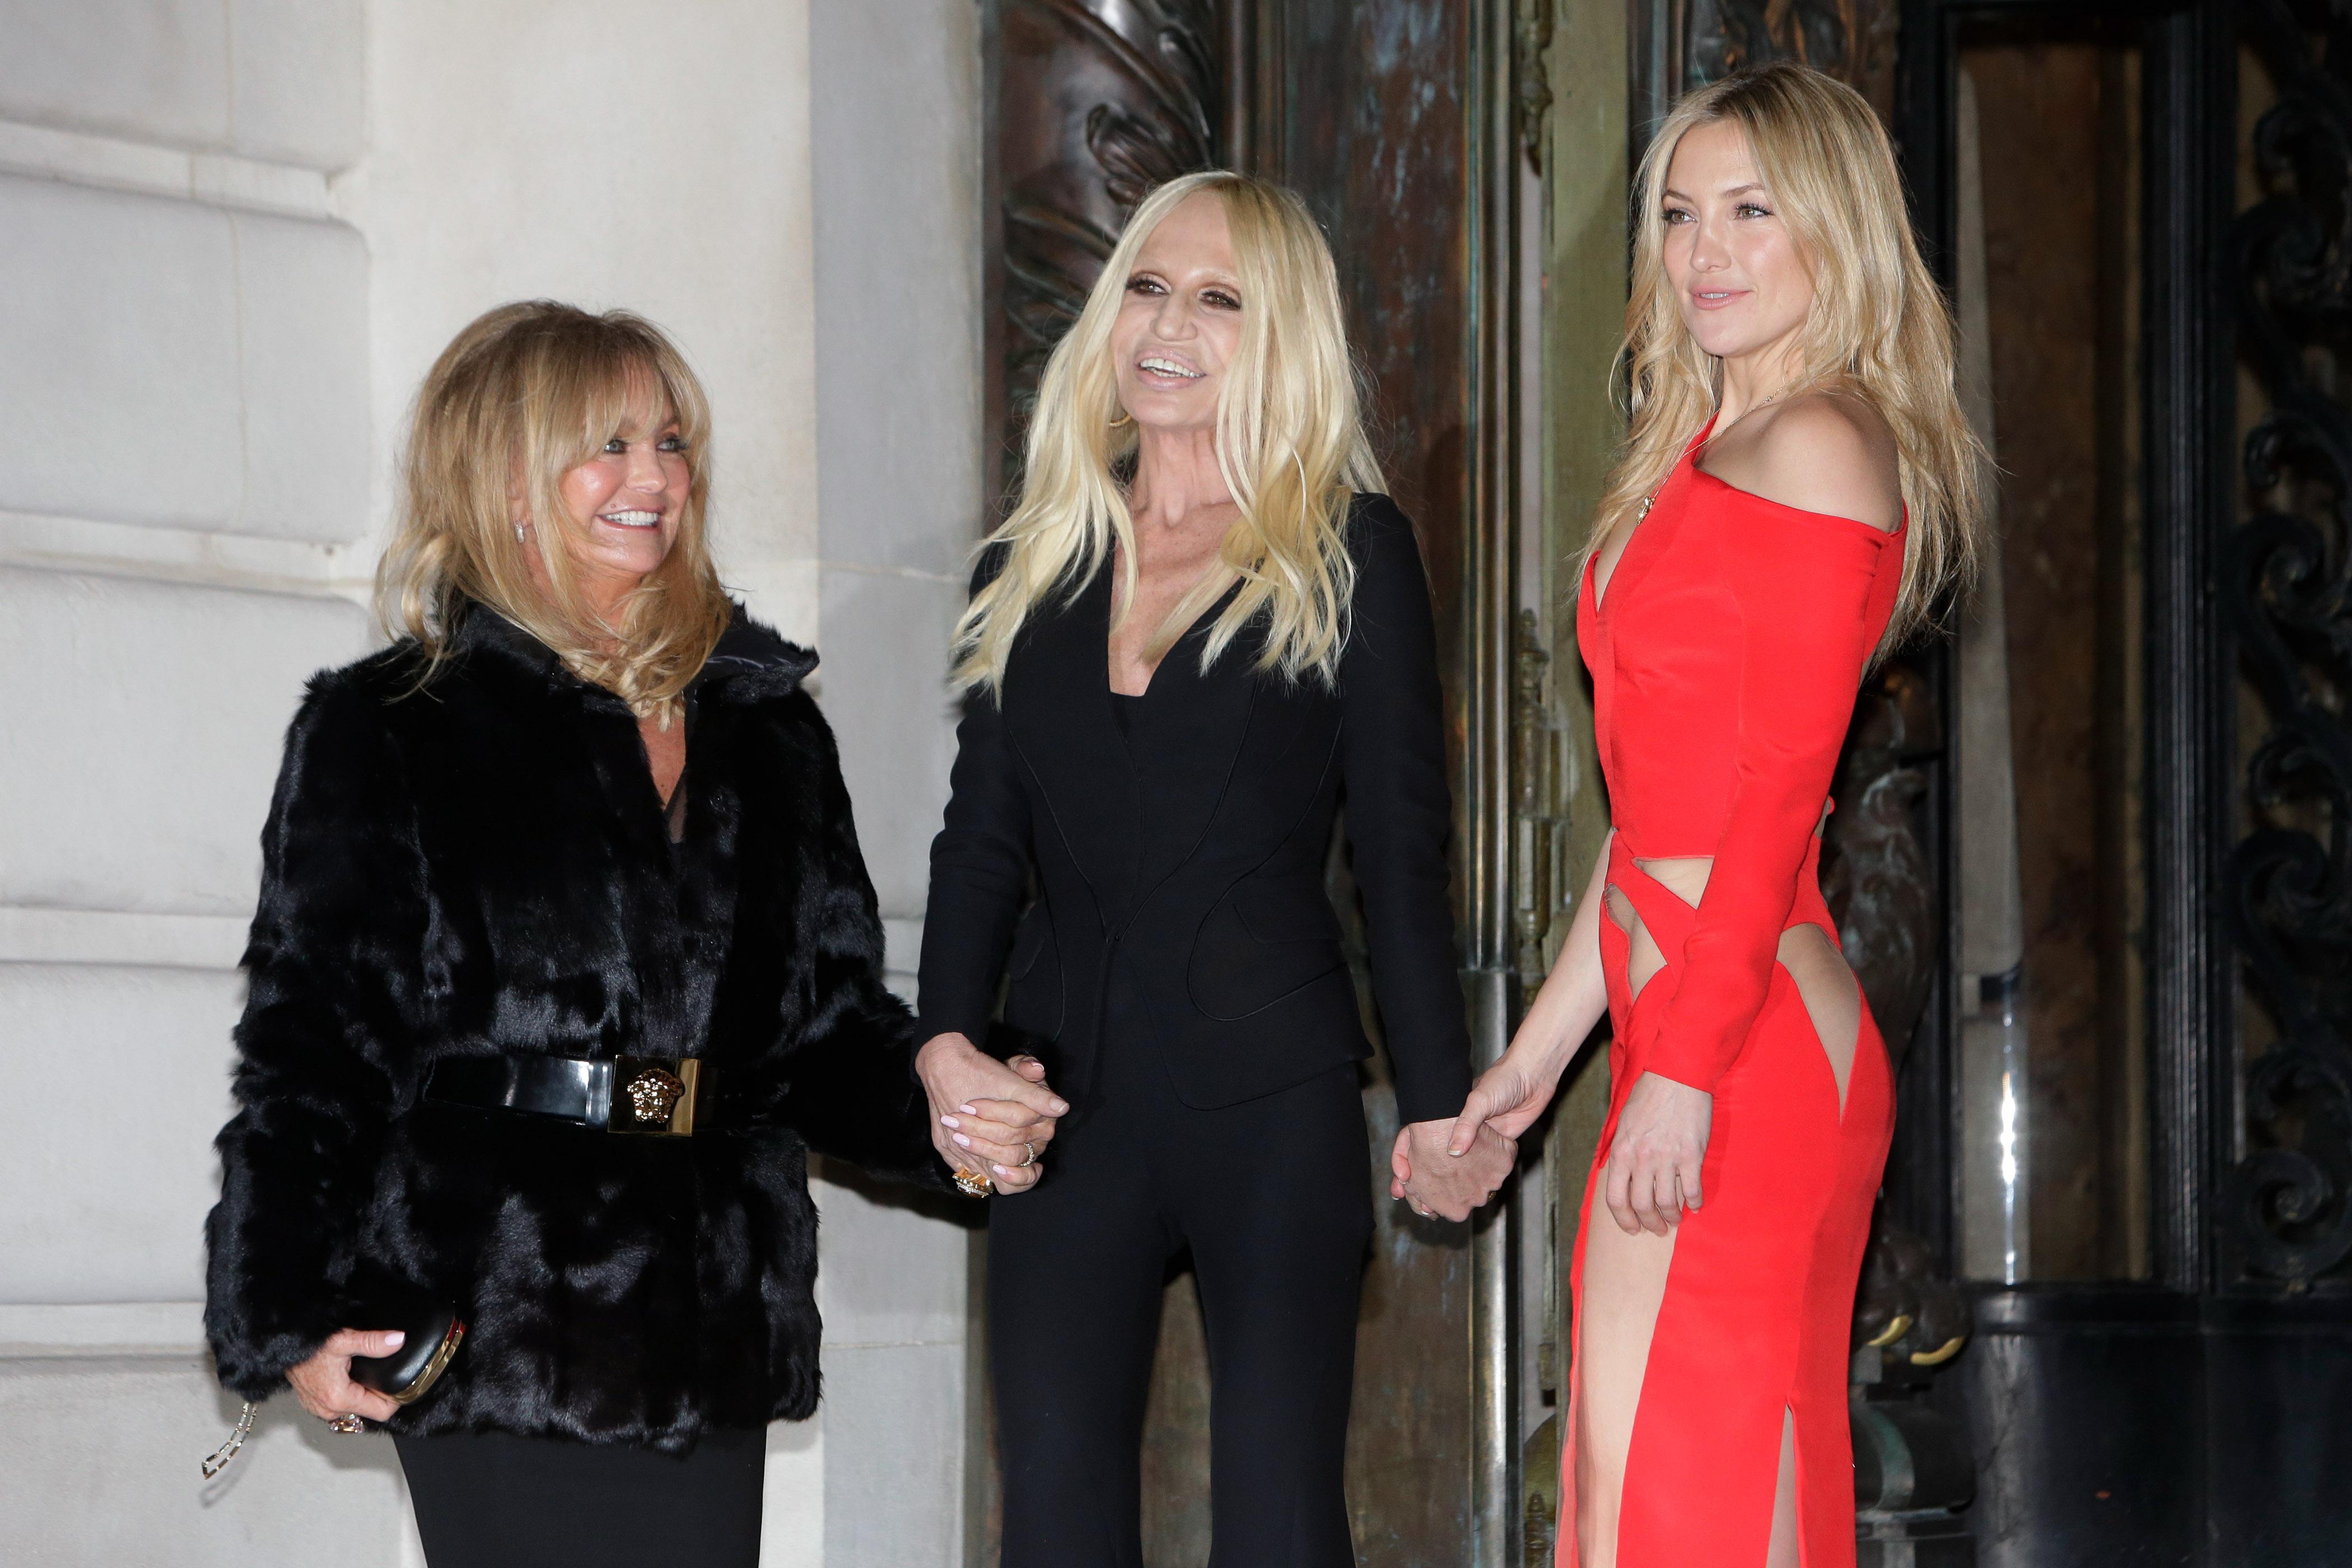 Kate Hudson reveals derriere at Versace, Portman hits Dior